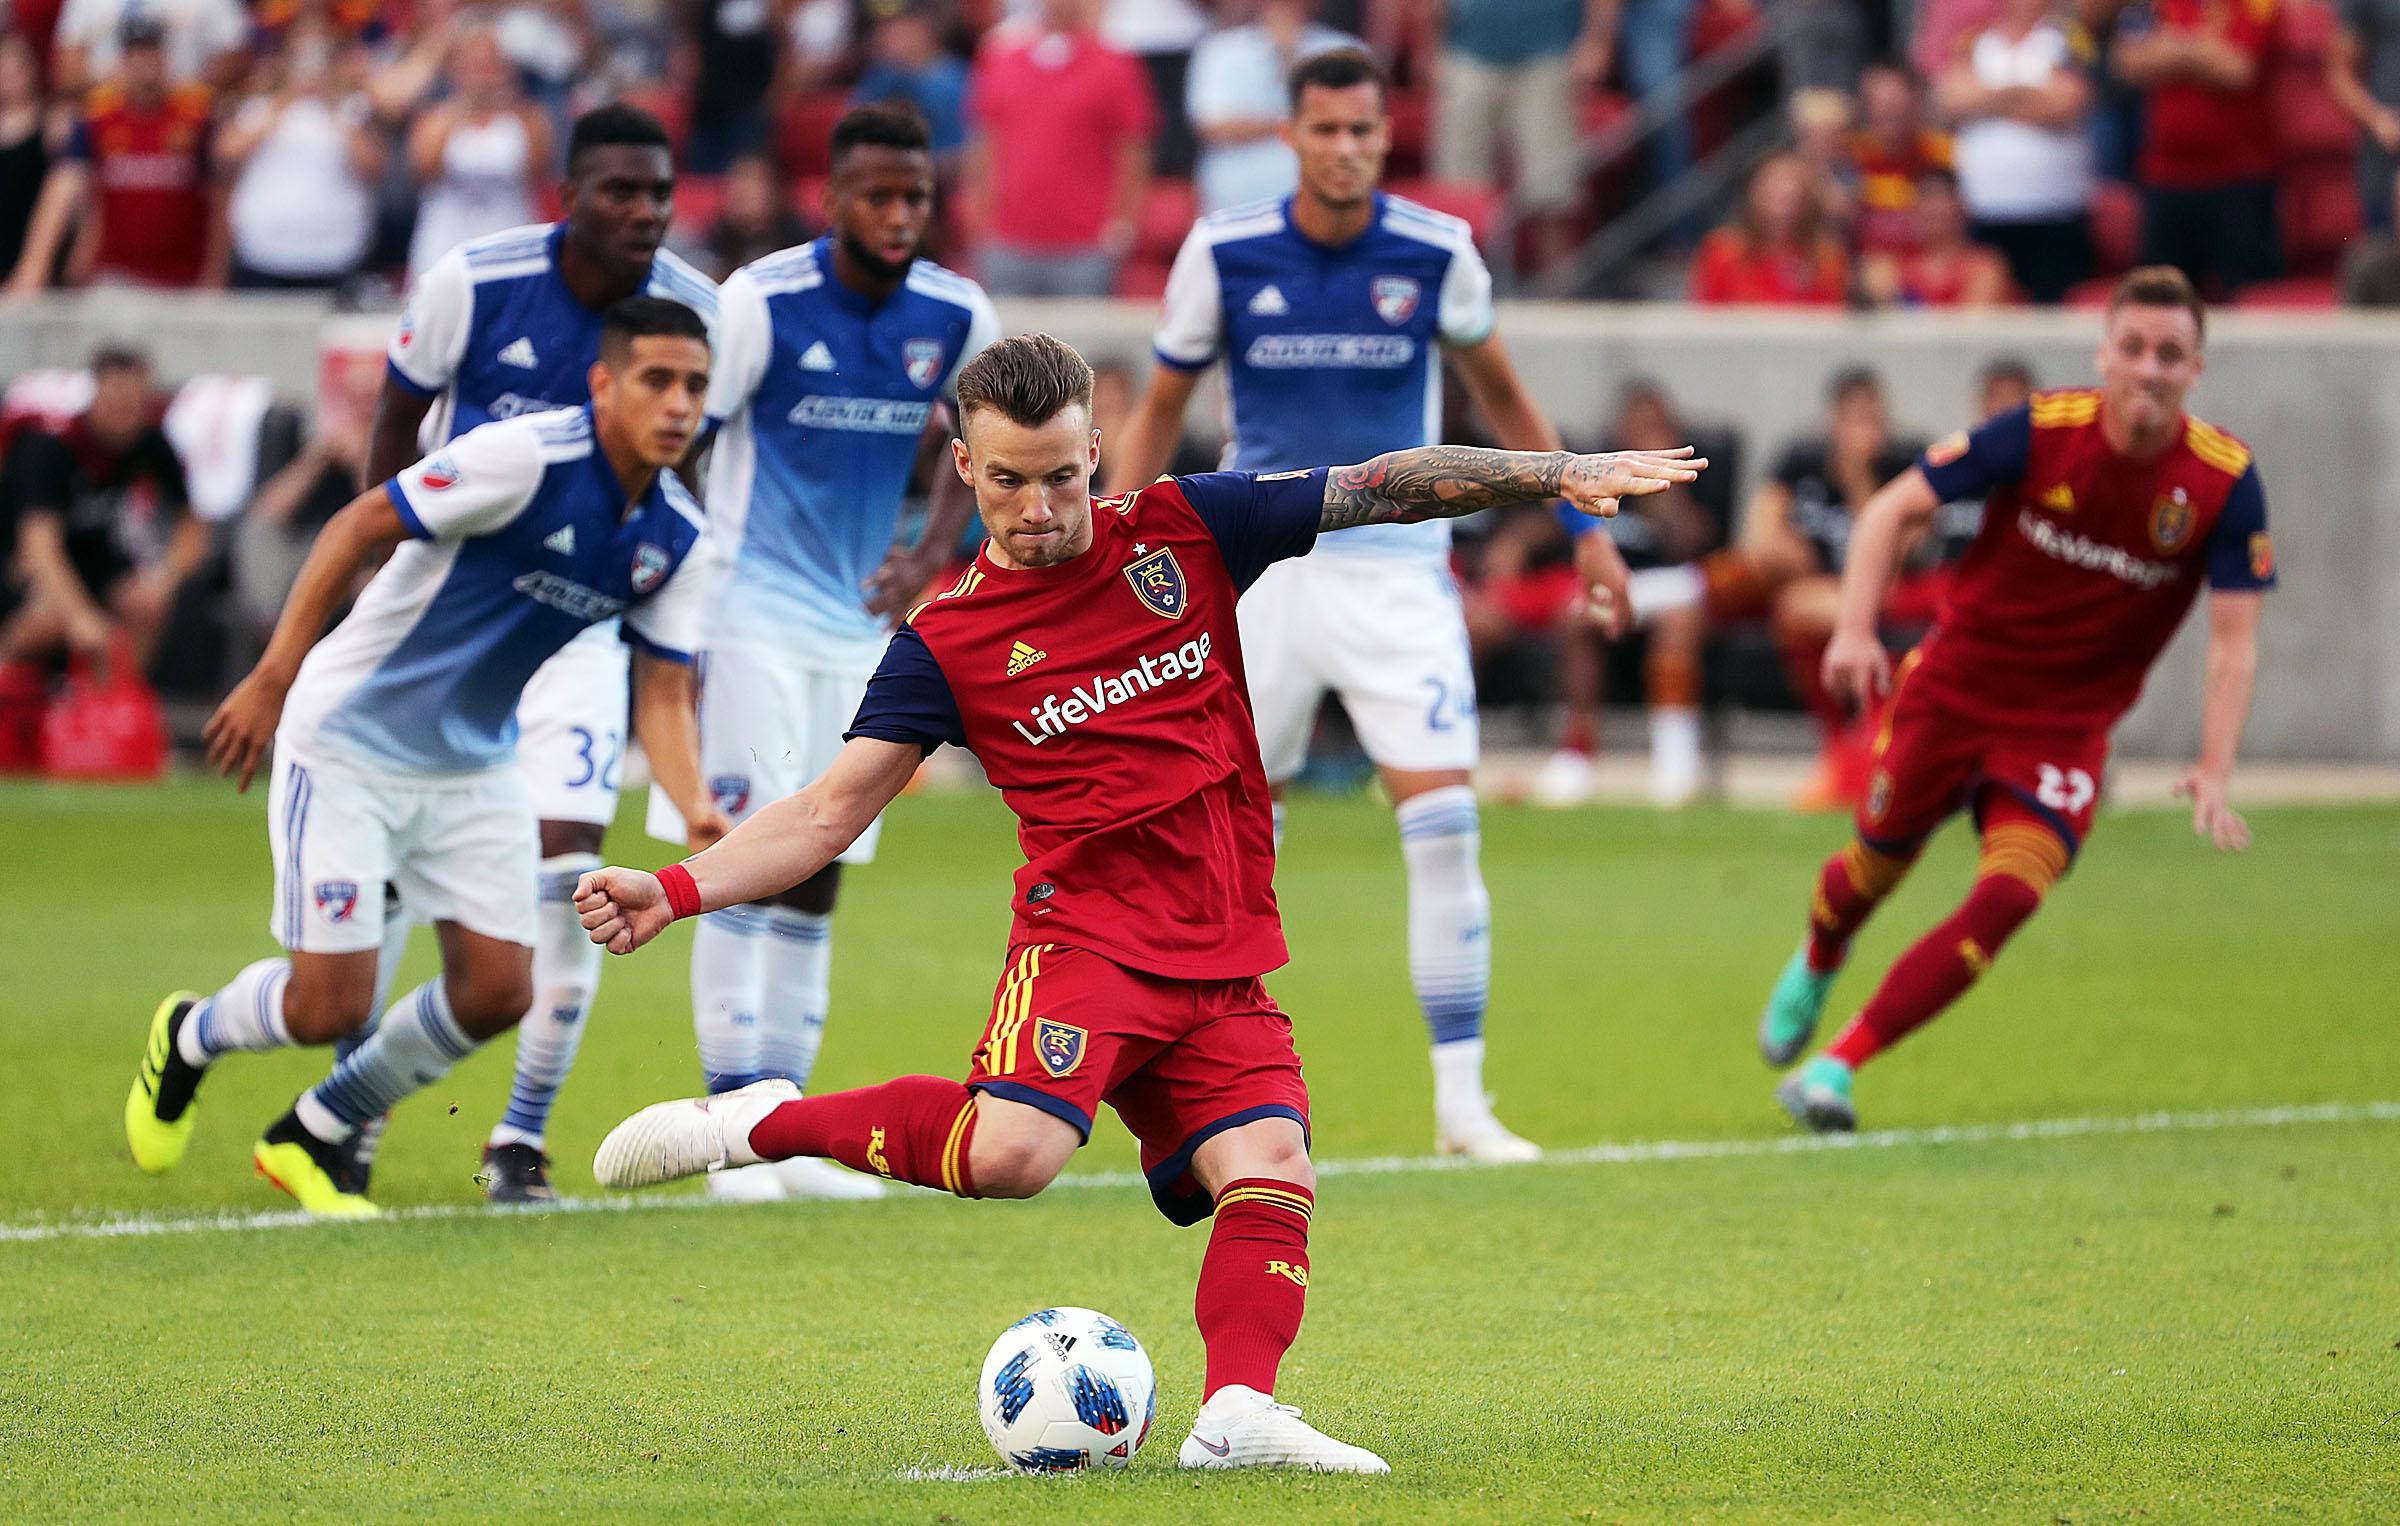 Real Salt Lake midfielder Albert Rusnak (11) scores on a penalty kick against FC Dallas during MLS soccer in Sandy on Saturday, July 7, 2018.